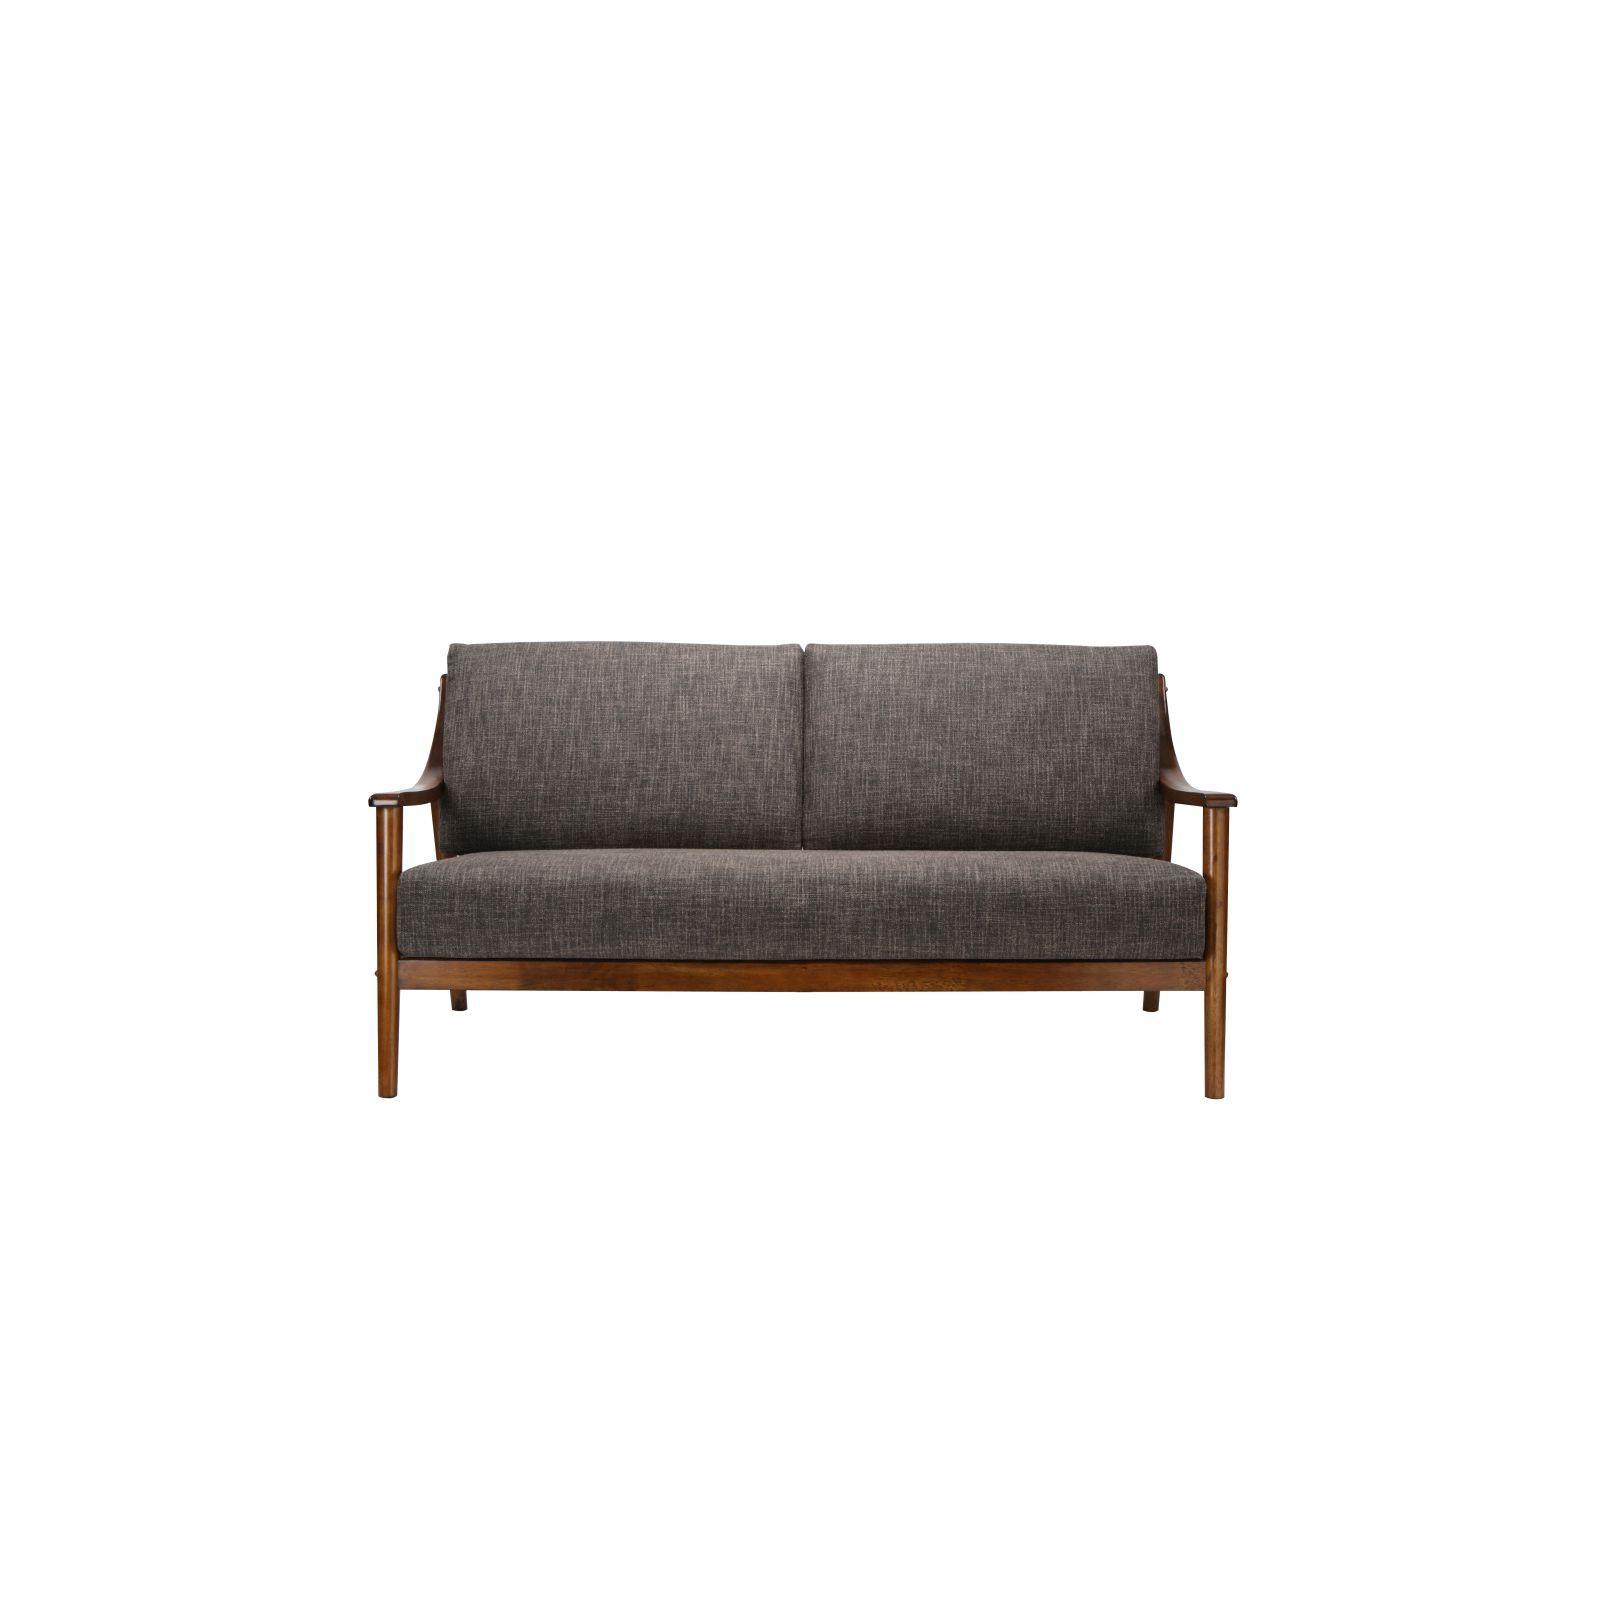 Famous Brennan Sofa Chairs Pertaining To Brennan 3 Seater (Fab) Lava Fabric Sofa – Sofa & Armchairs (View 8 of 20)